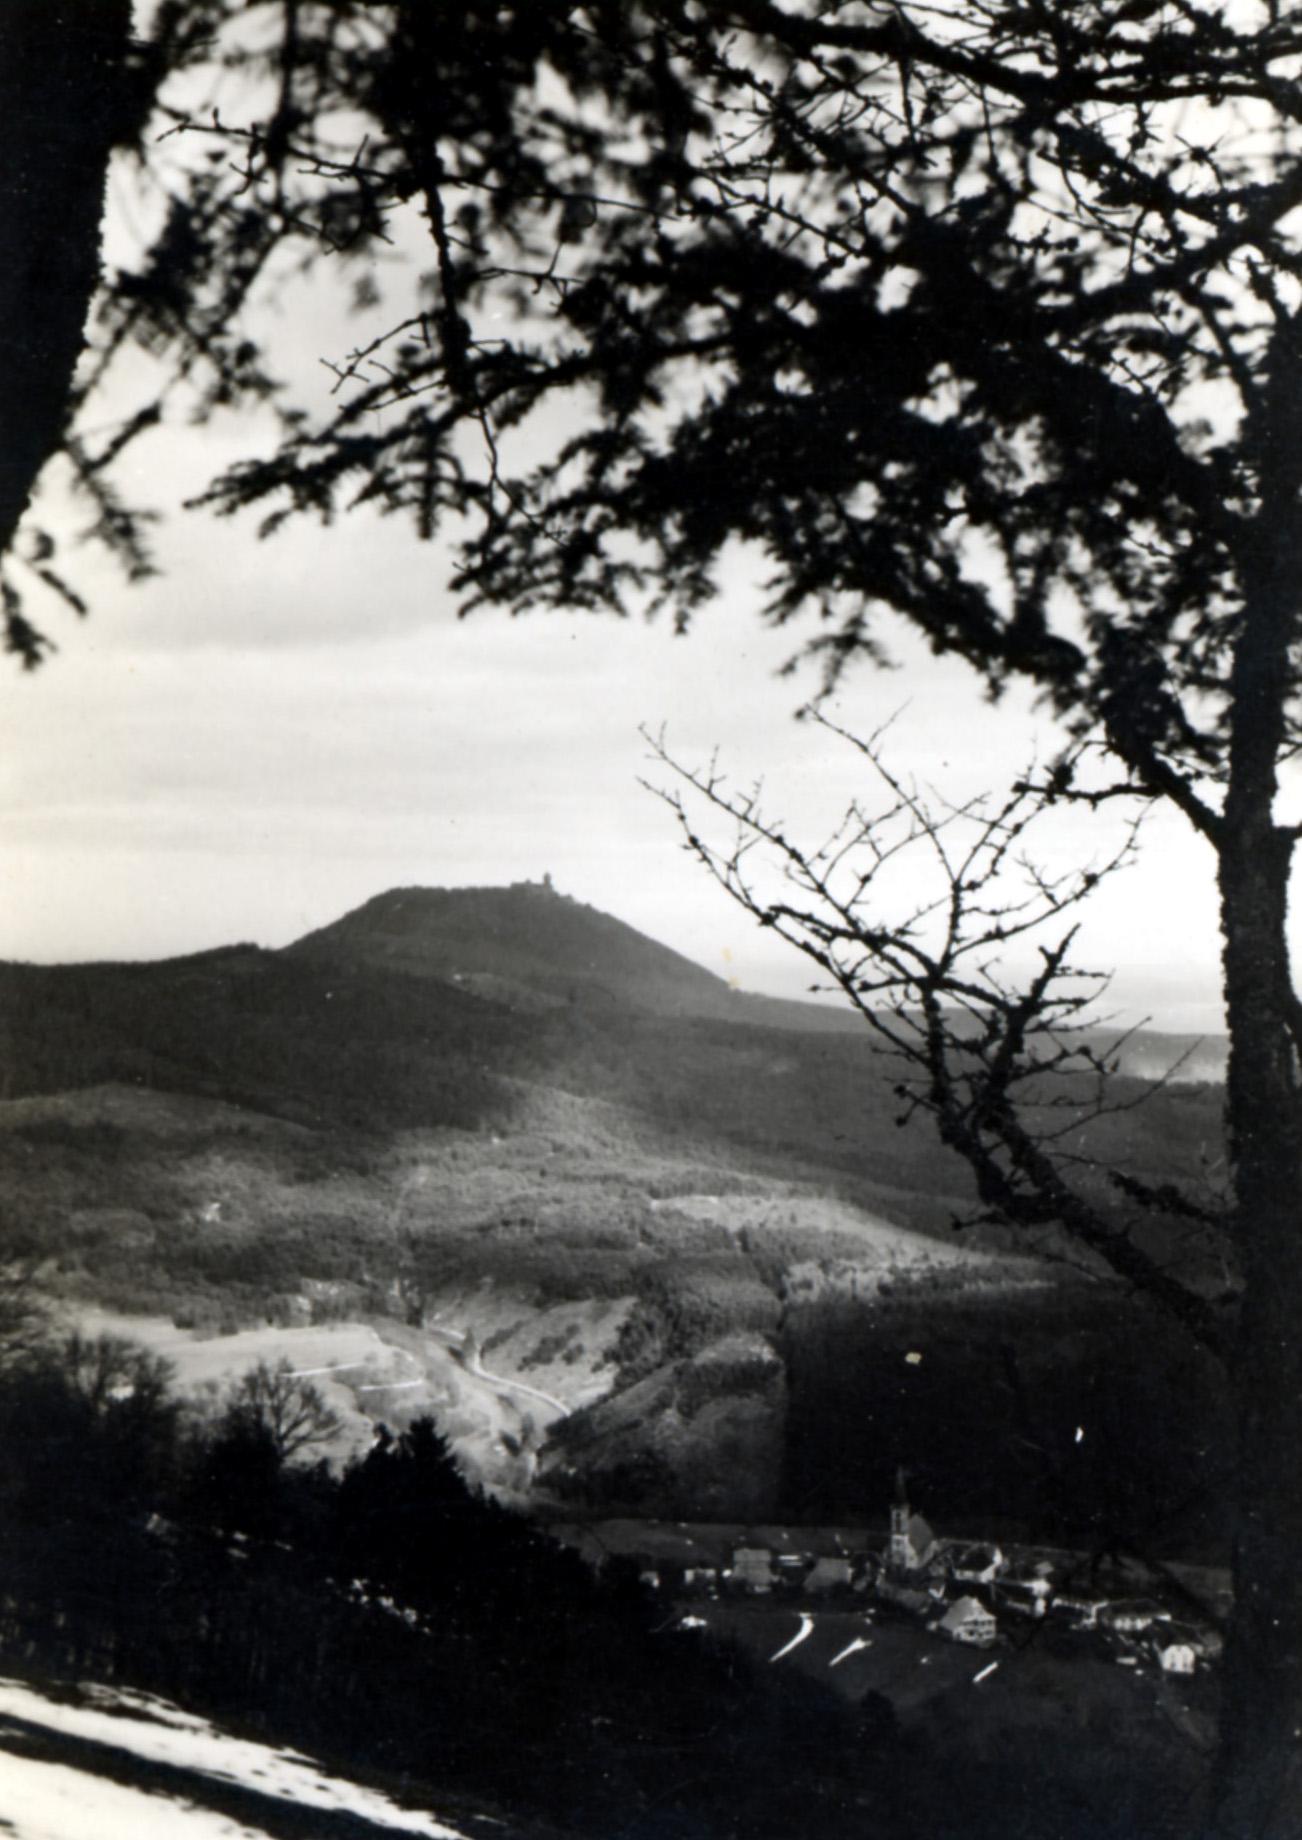 1941 thannenkirch renardiere